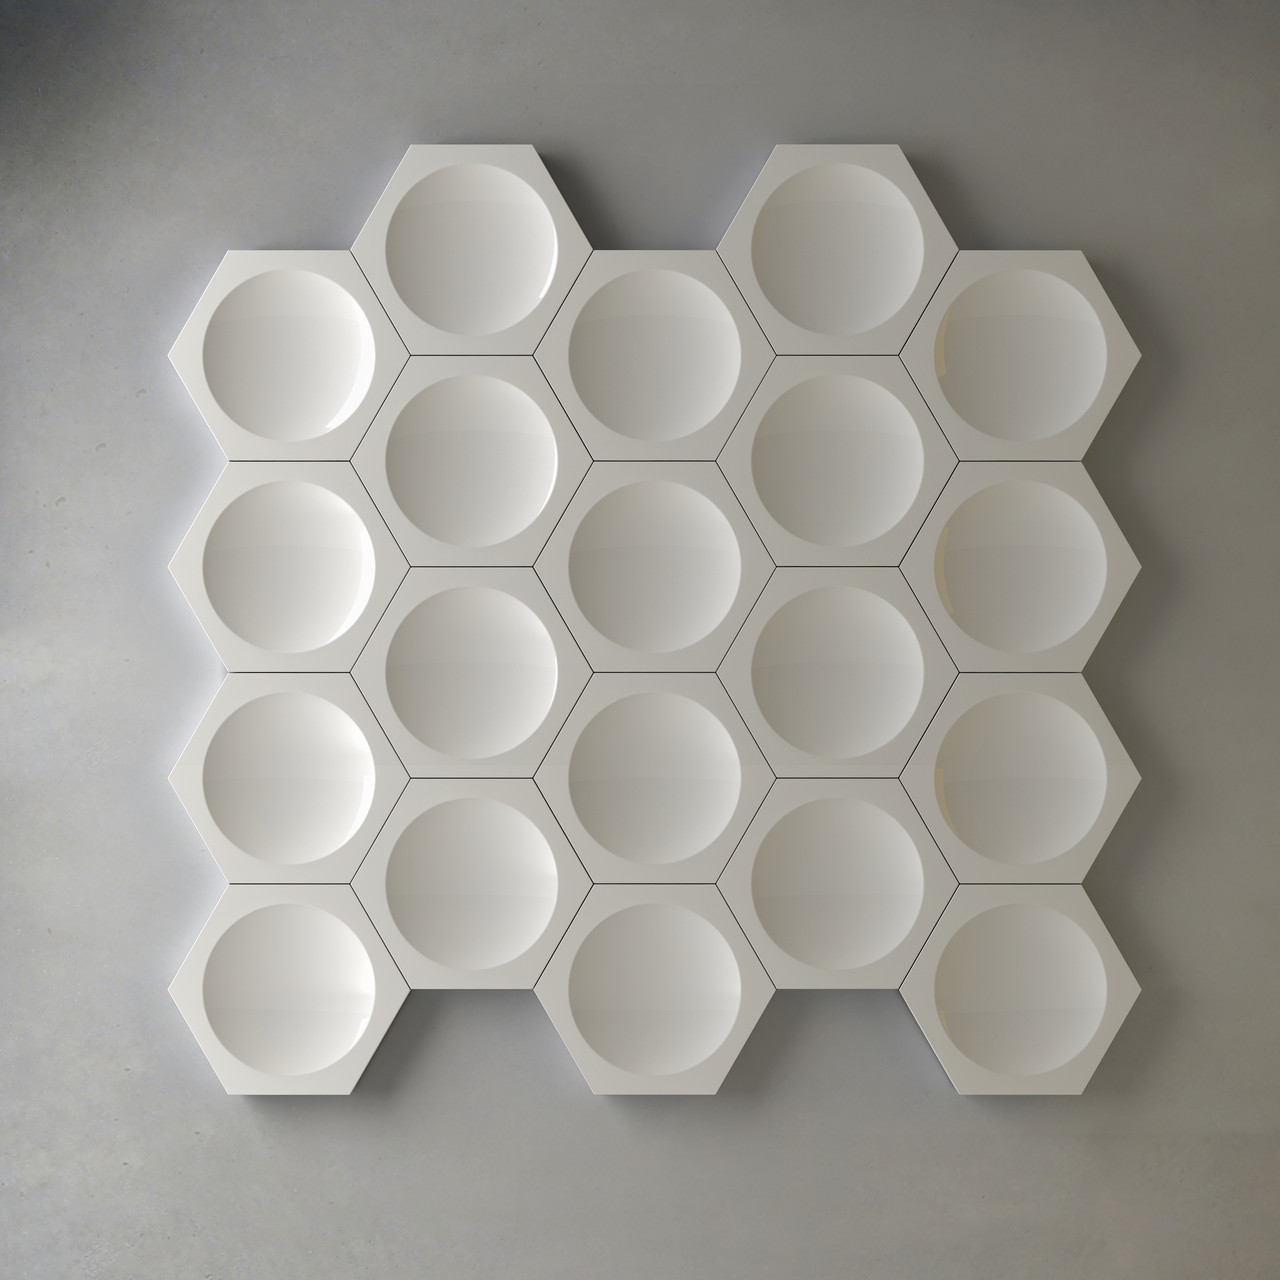 G-2 Eco Collection 3D панели гипсовые